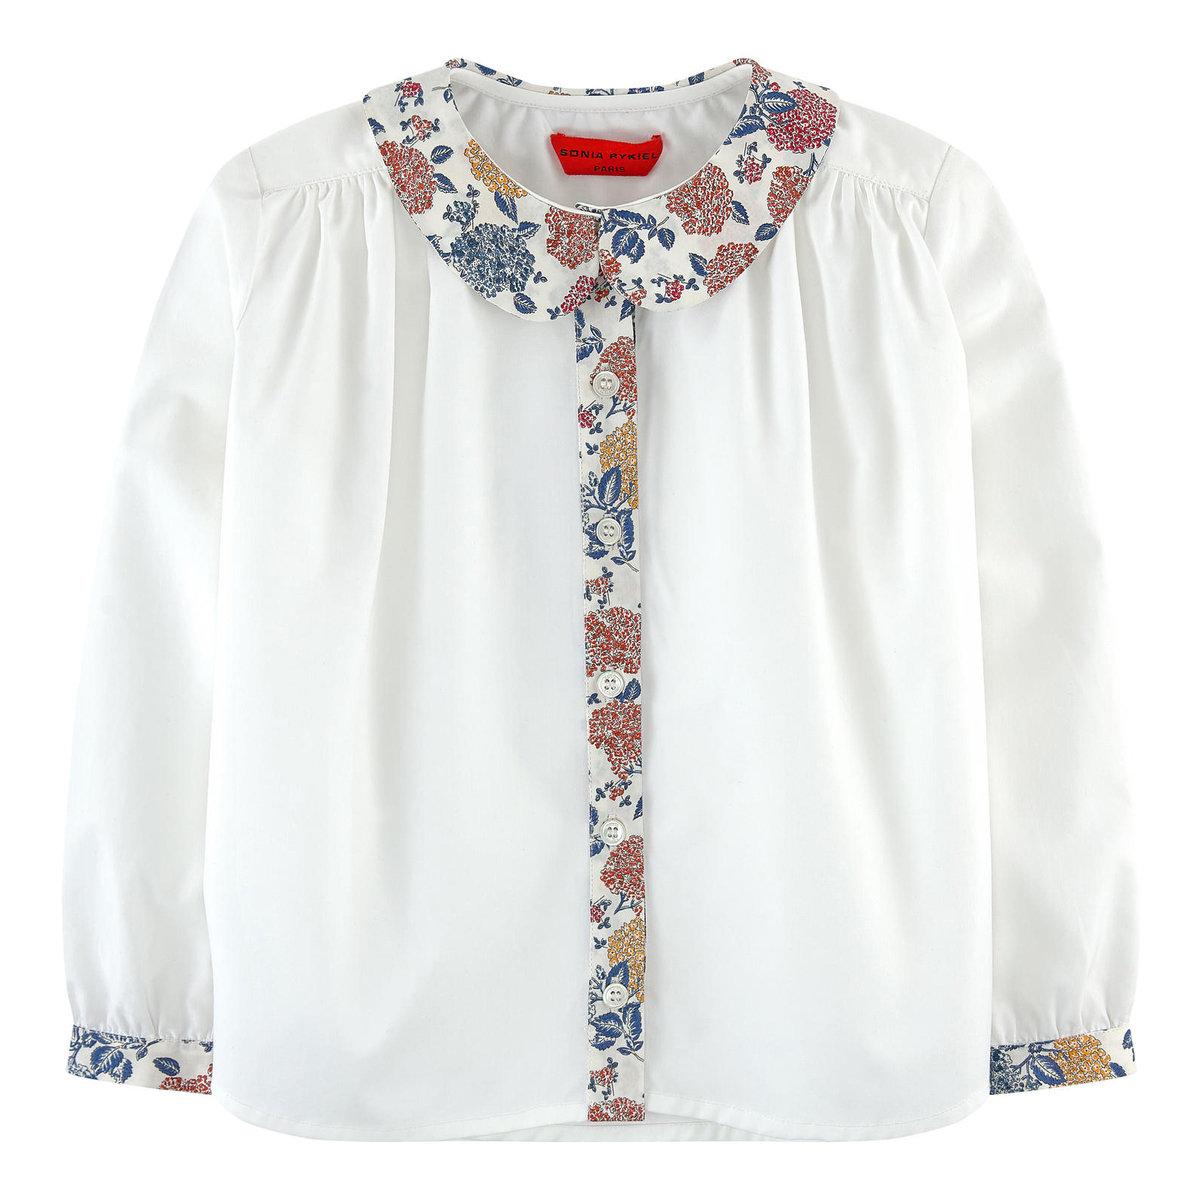 White Blouse With A Peter Pan Collar Sonia Rykiel Enfant Tees